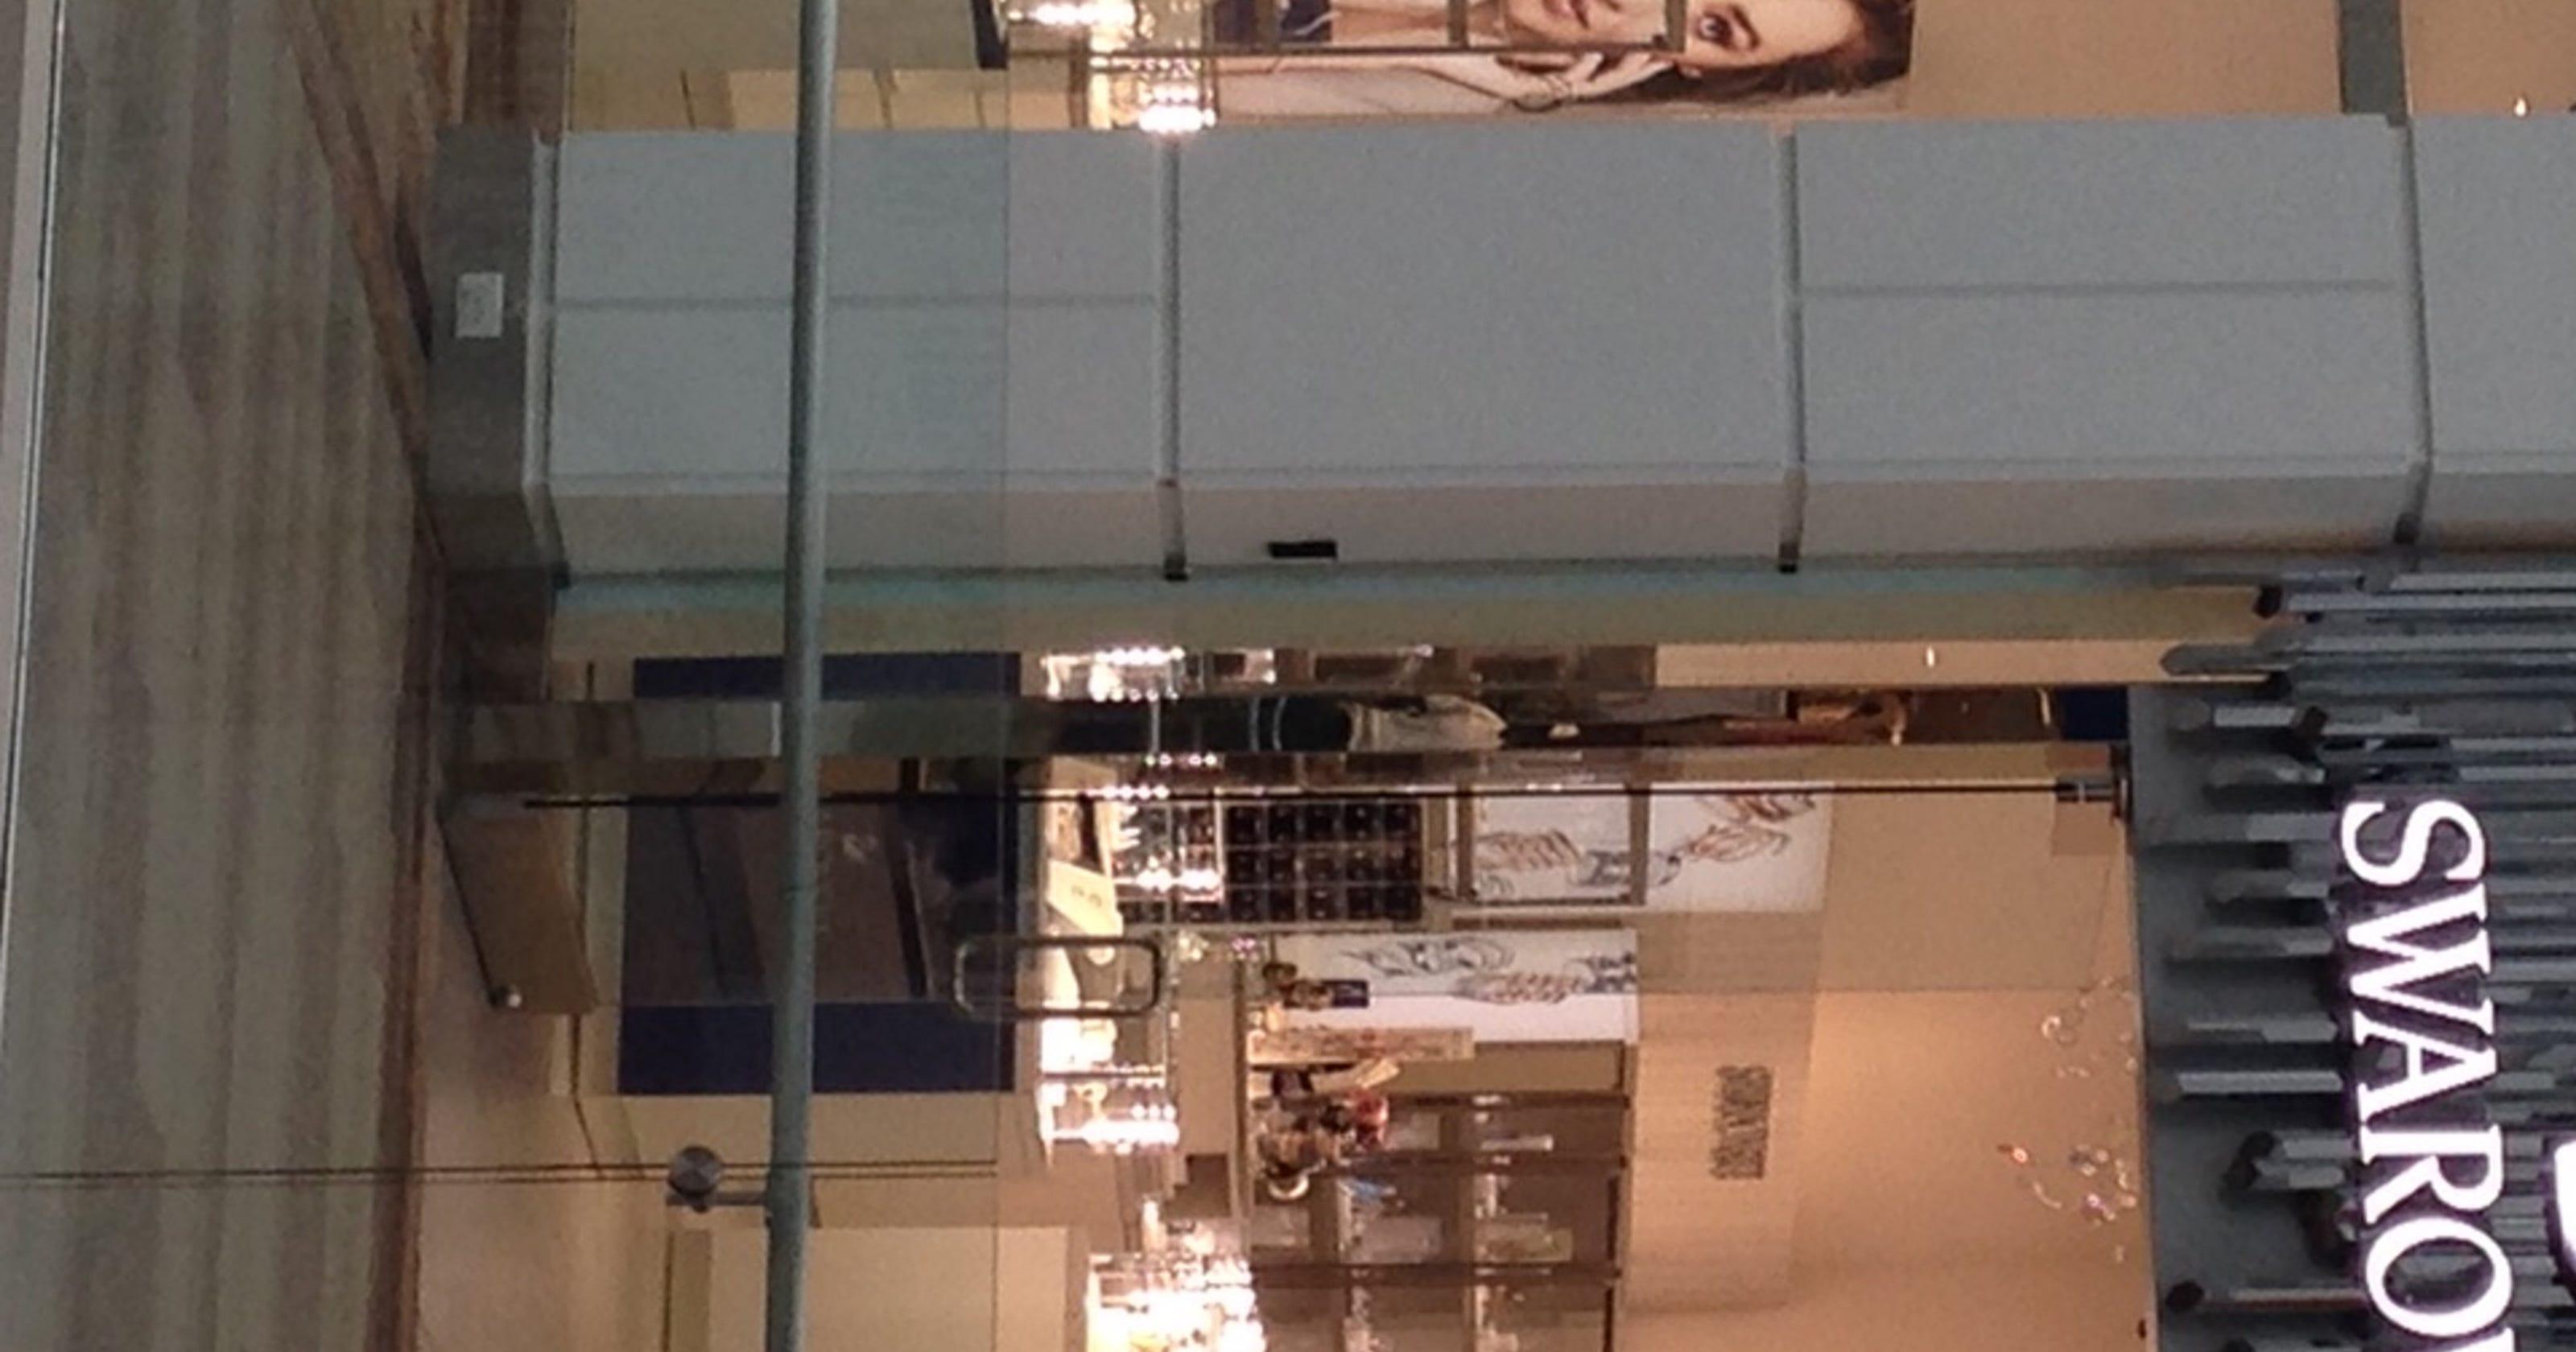 6c6acd11b Menlo's Swarovski crystal reopens after renovation